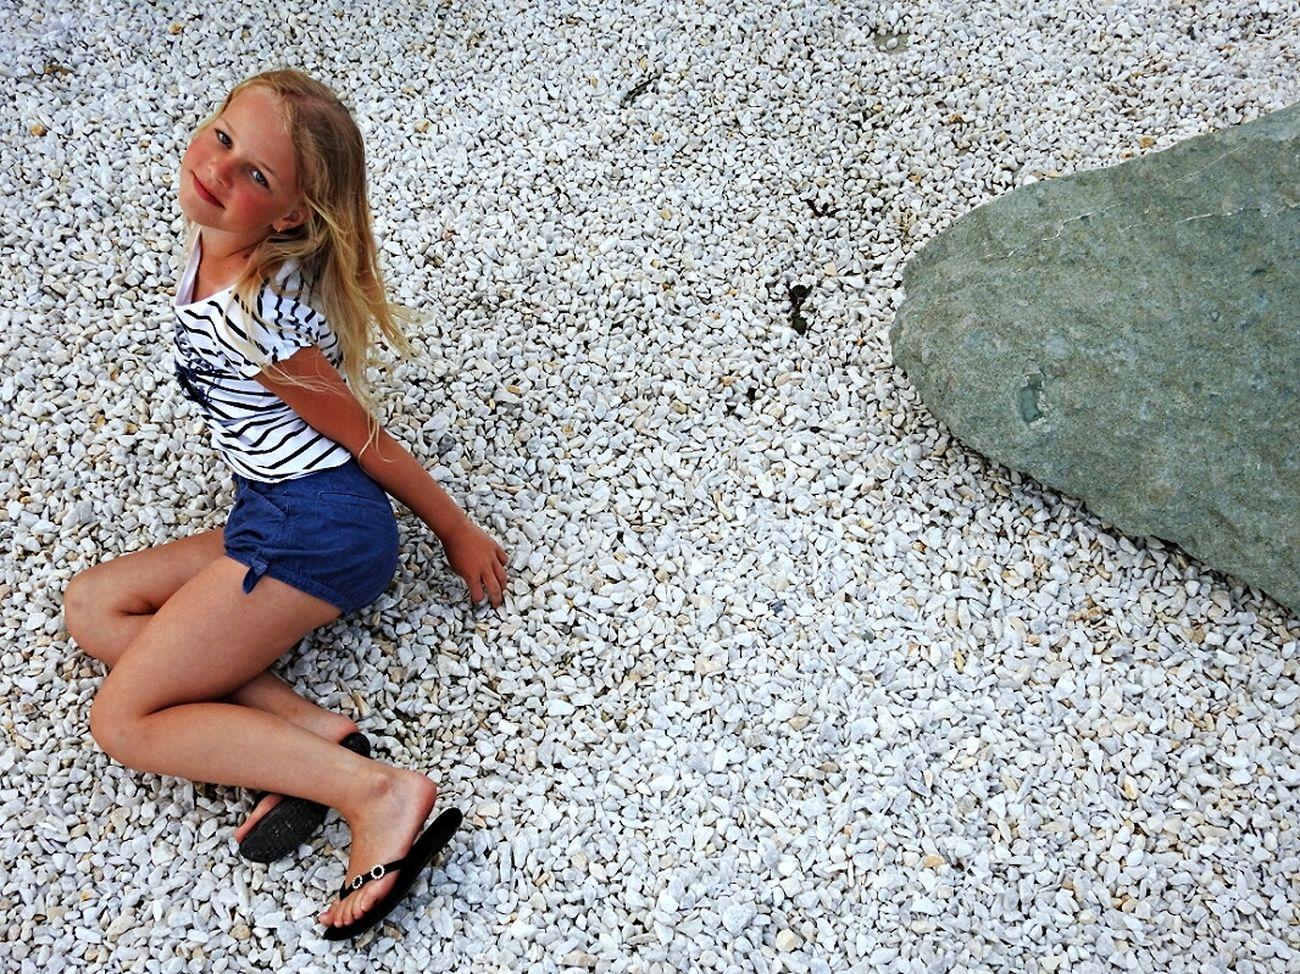 Enjoying Life Adler Holiday Angelina Daughter Angel Stone Embankment Russia